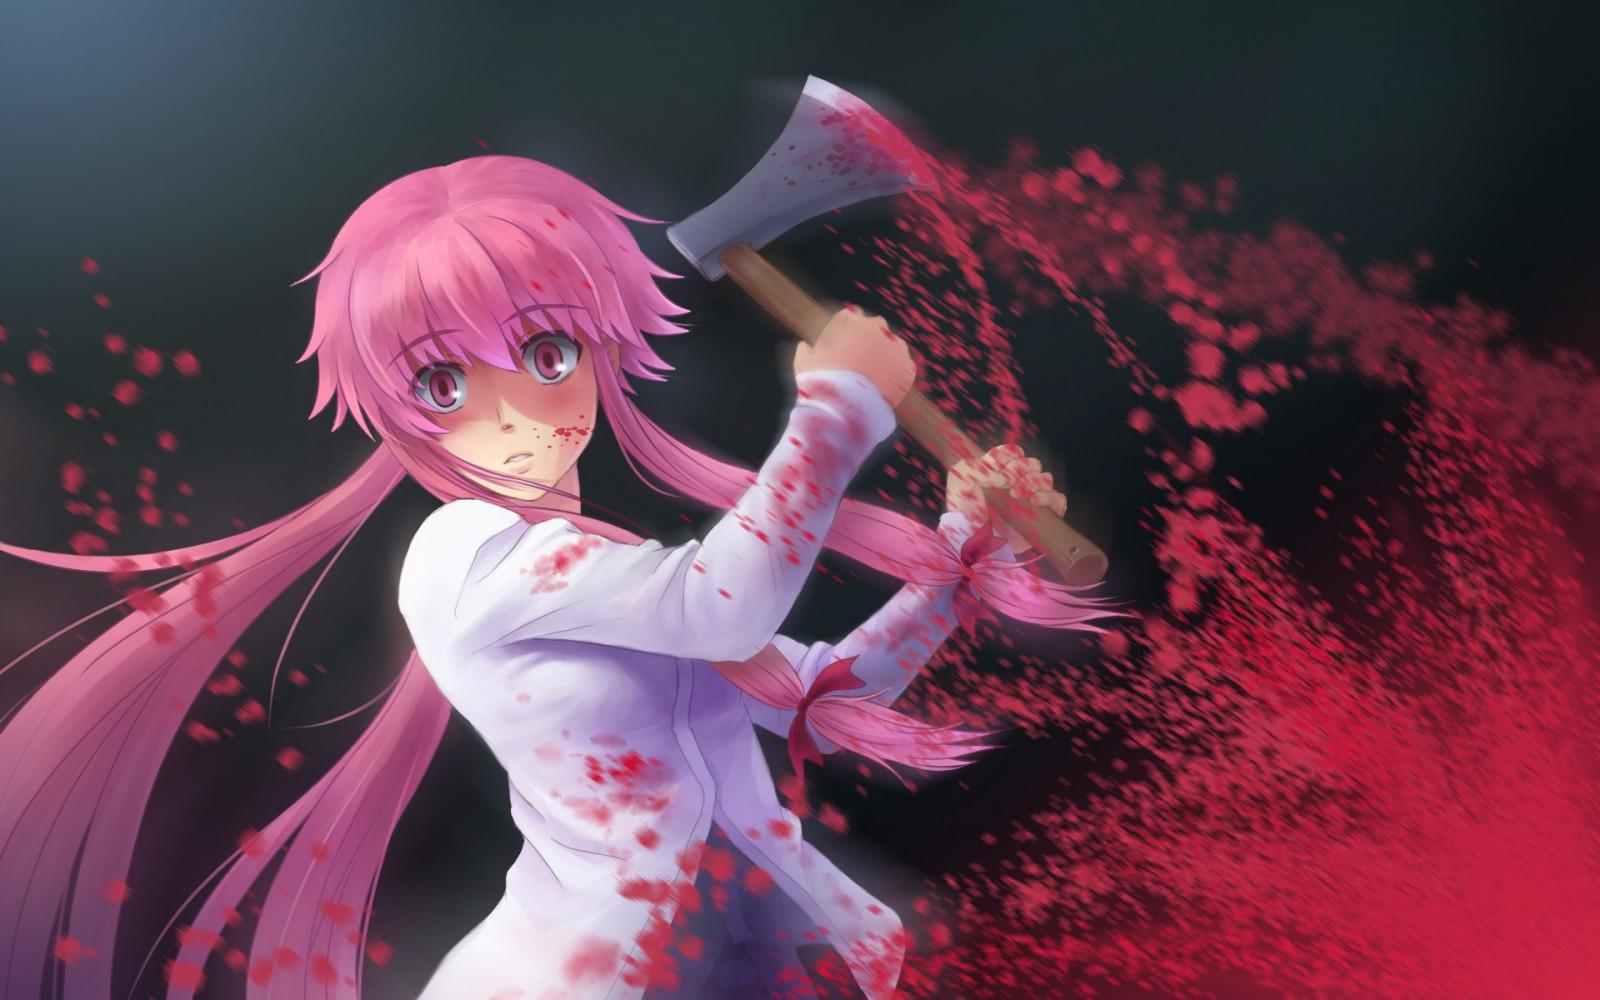 anime, anime girls, red, blood, axes, Mirai Nikki, Gasai Yuno, yandere, Blood anime